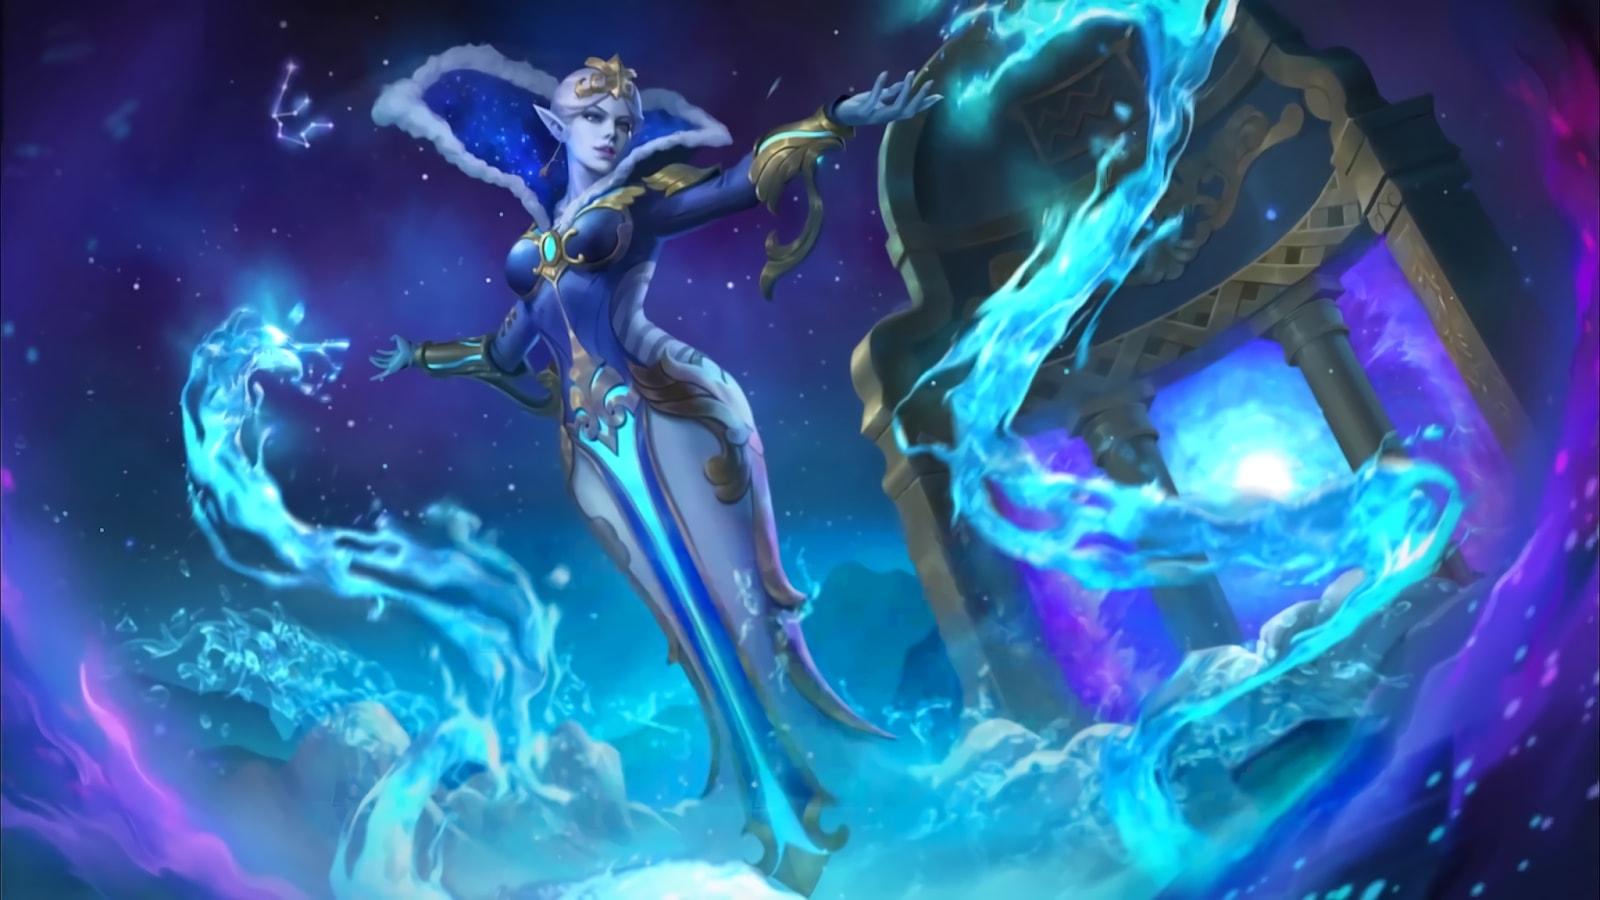 Wallpaper Aurora Aquarius Skin Mobile Legends HD for PC